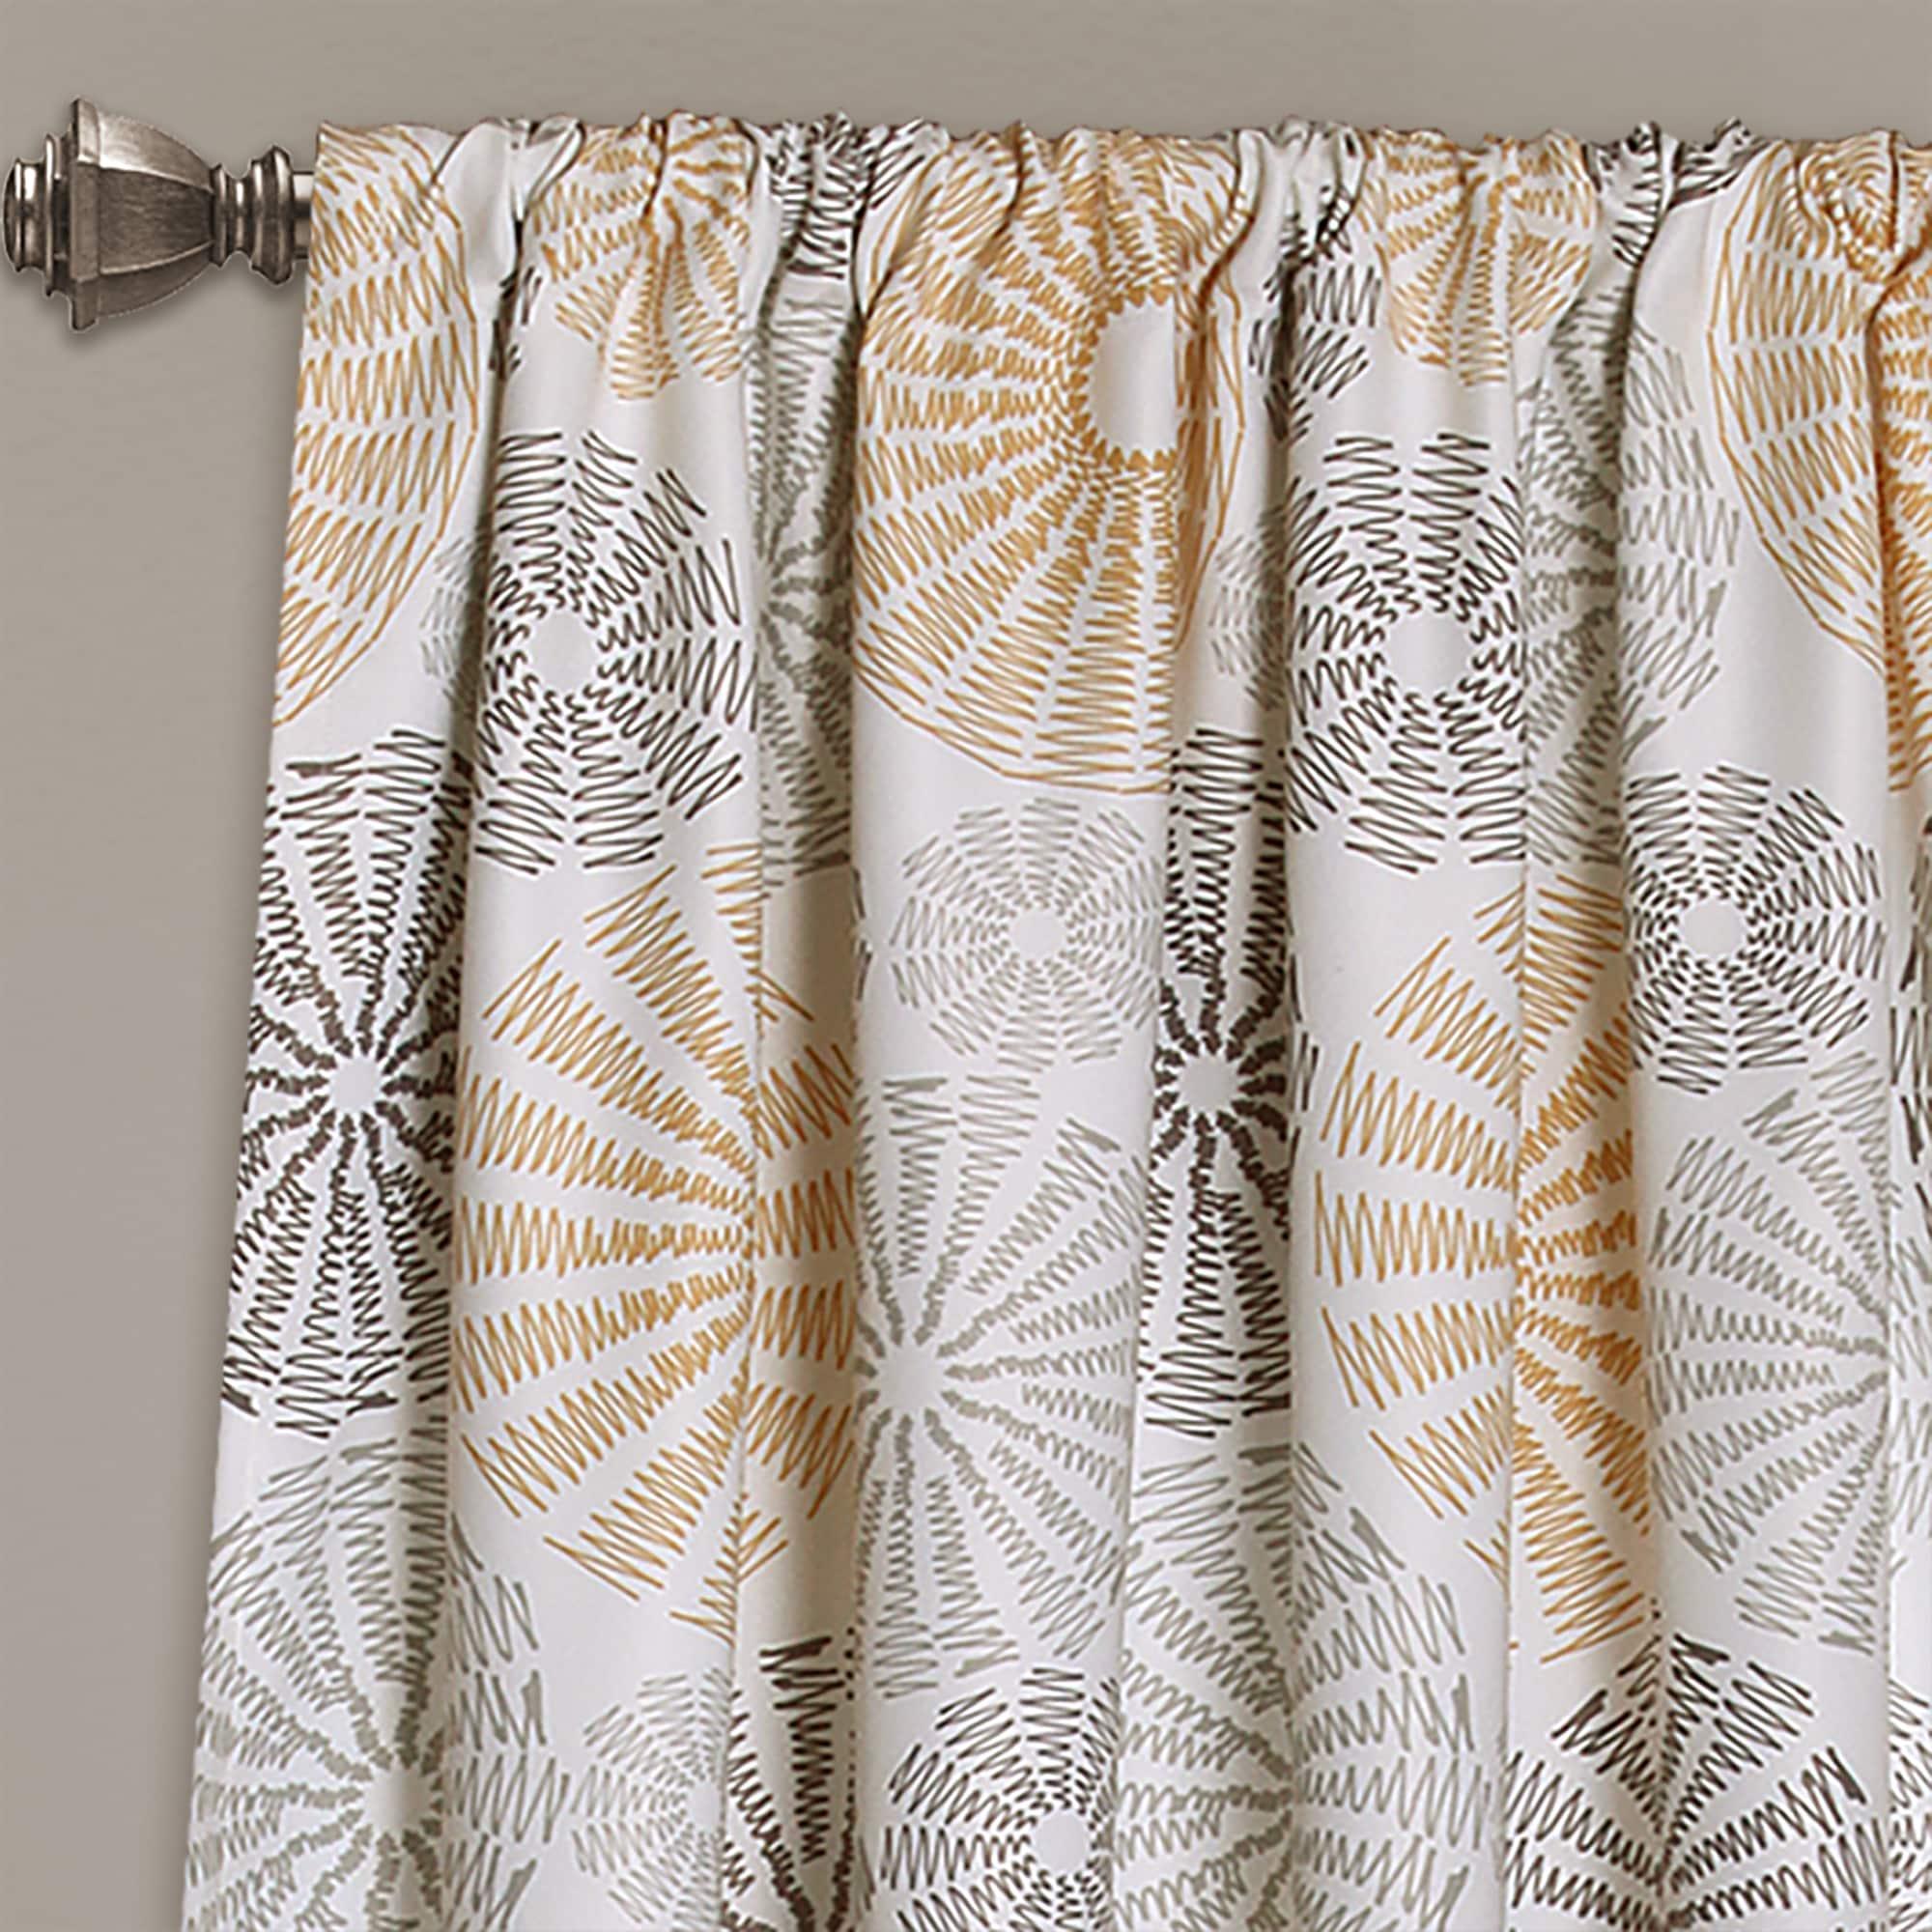 Lush Decor Multi Circles Room Darkening Window Curtain Panel Pair 52 W X 84 L Overstock 13393750